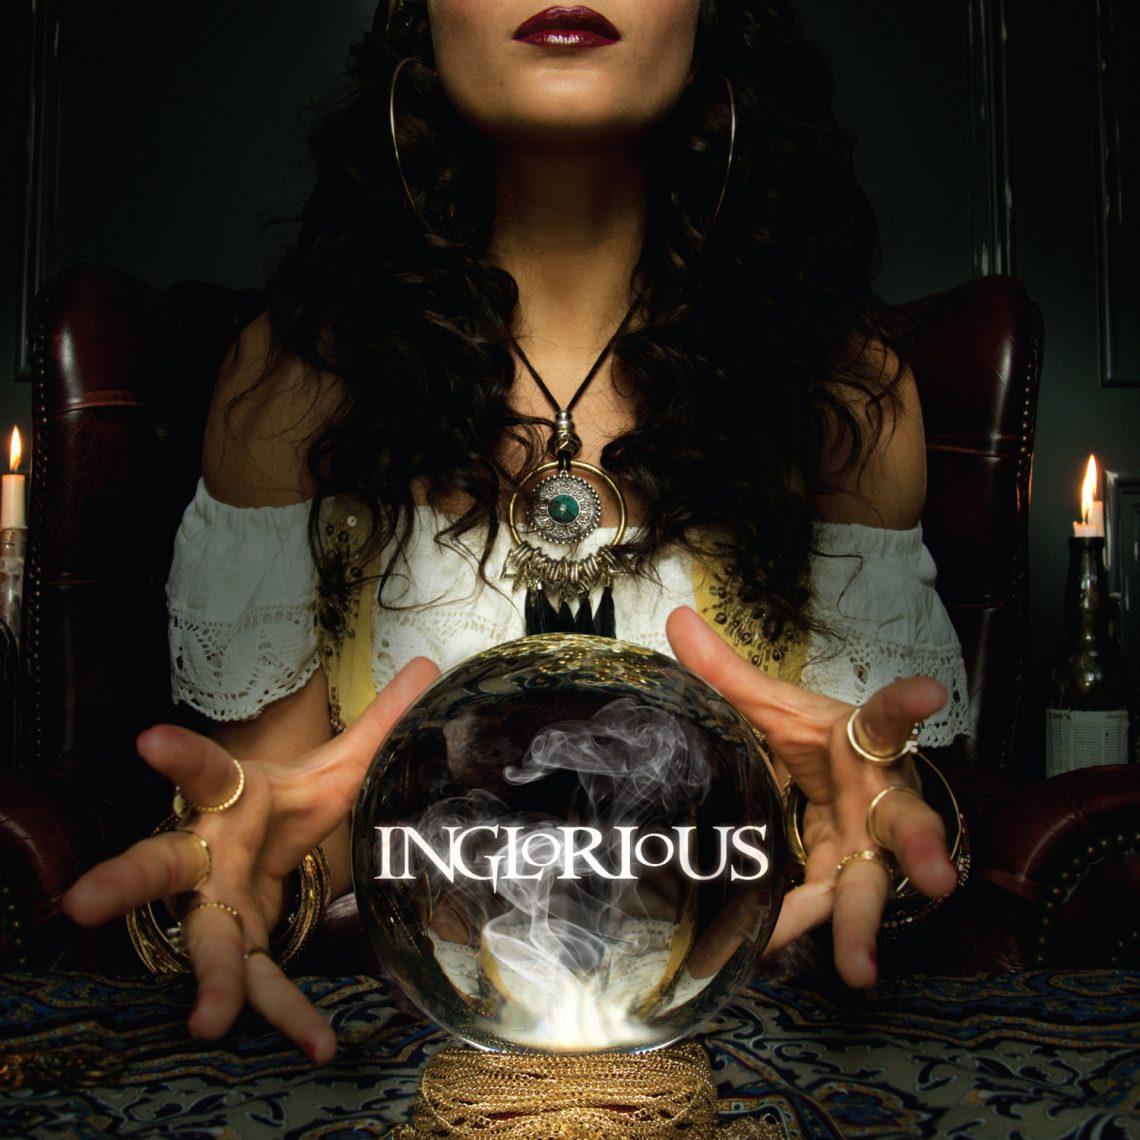 INGLORIOUS – INGLORIOUS – CD REVIEW